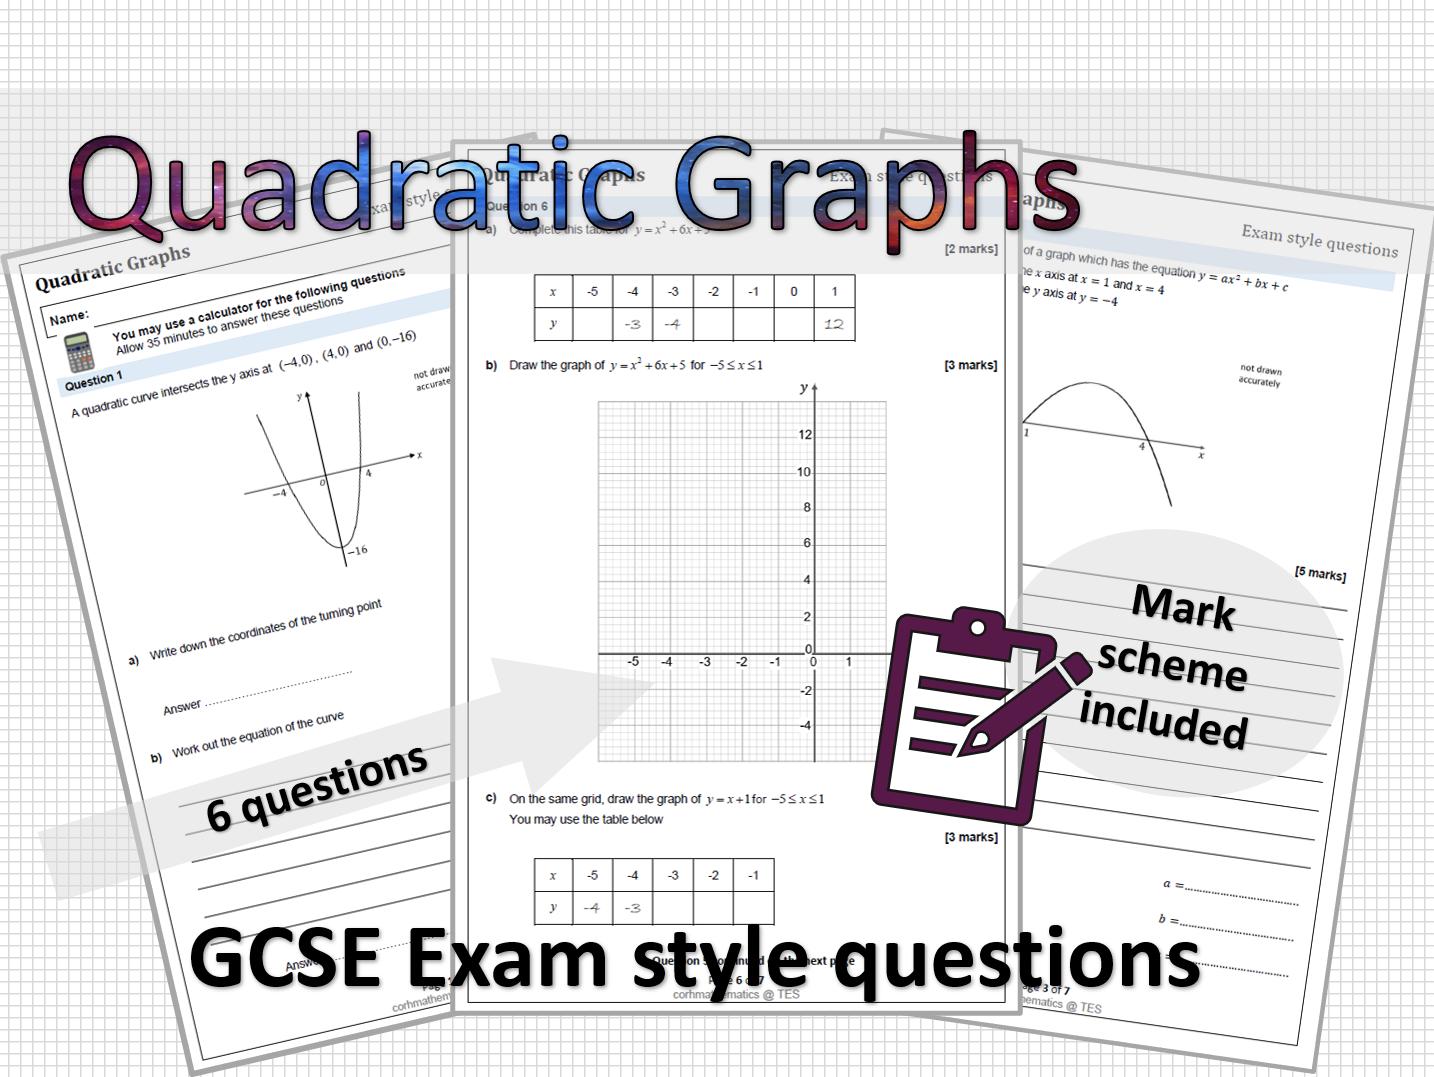 Quadratic Graphs exam style questions